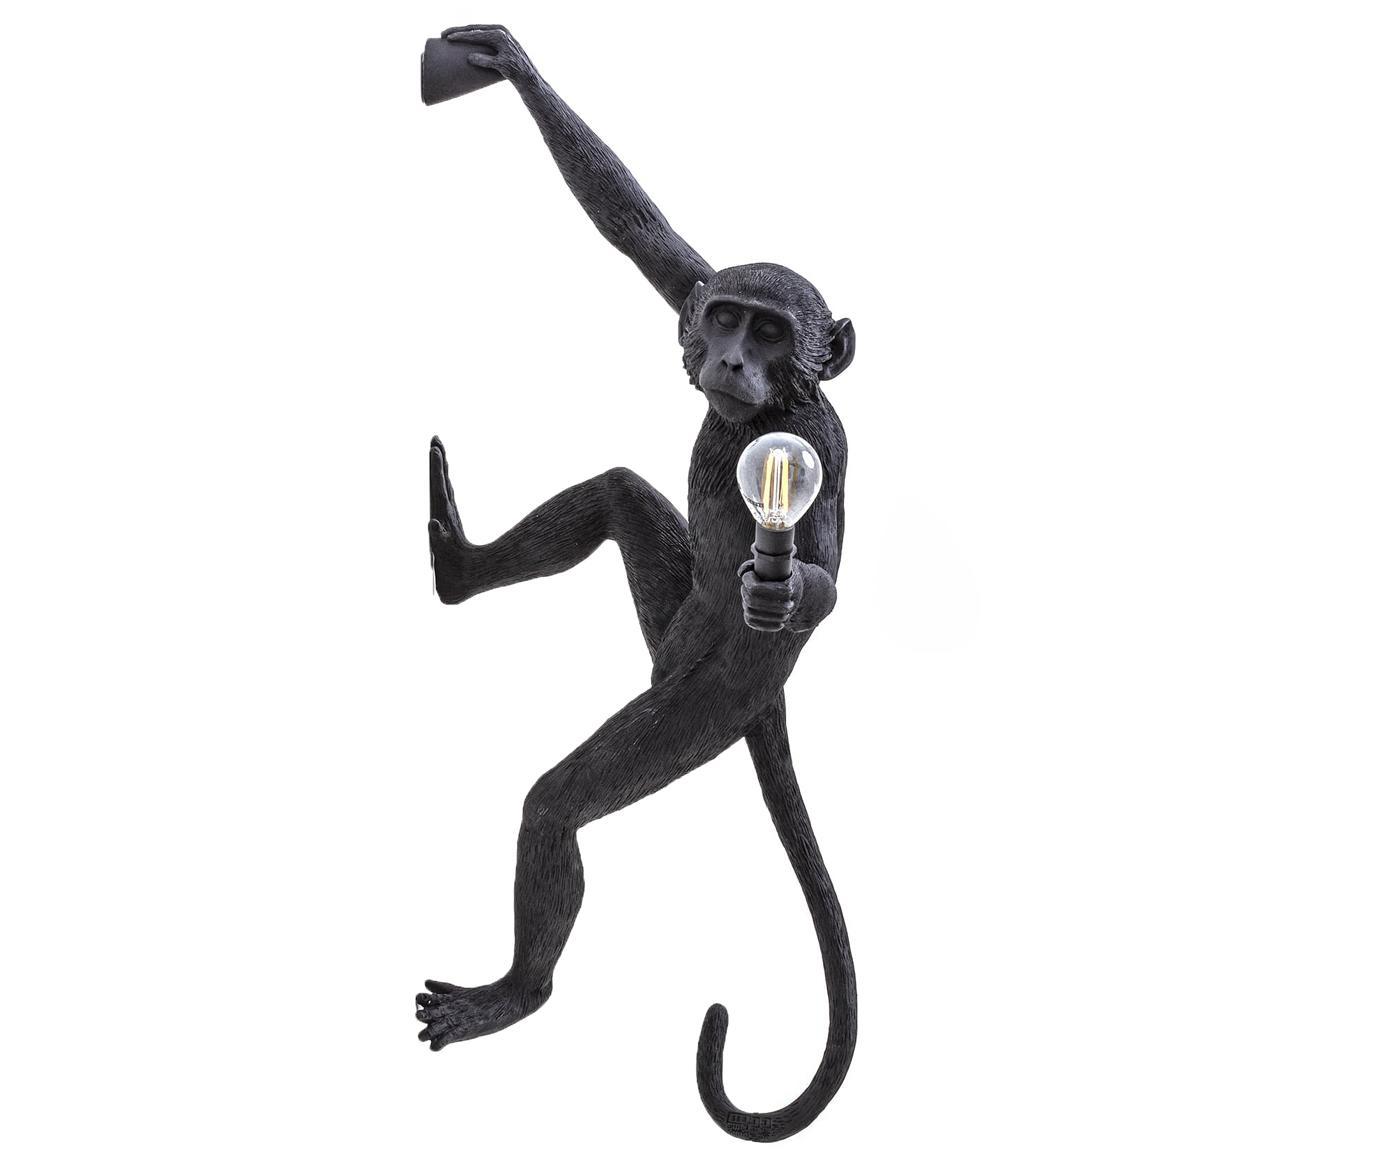 Wandlamp The Monkey met stekker, Polyresin, Zwart, 21 x 77 cm